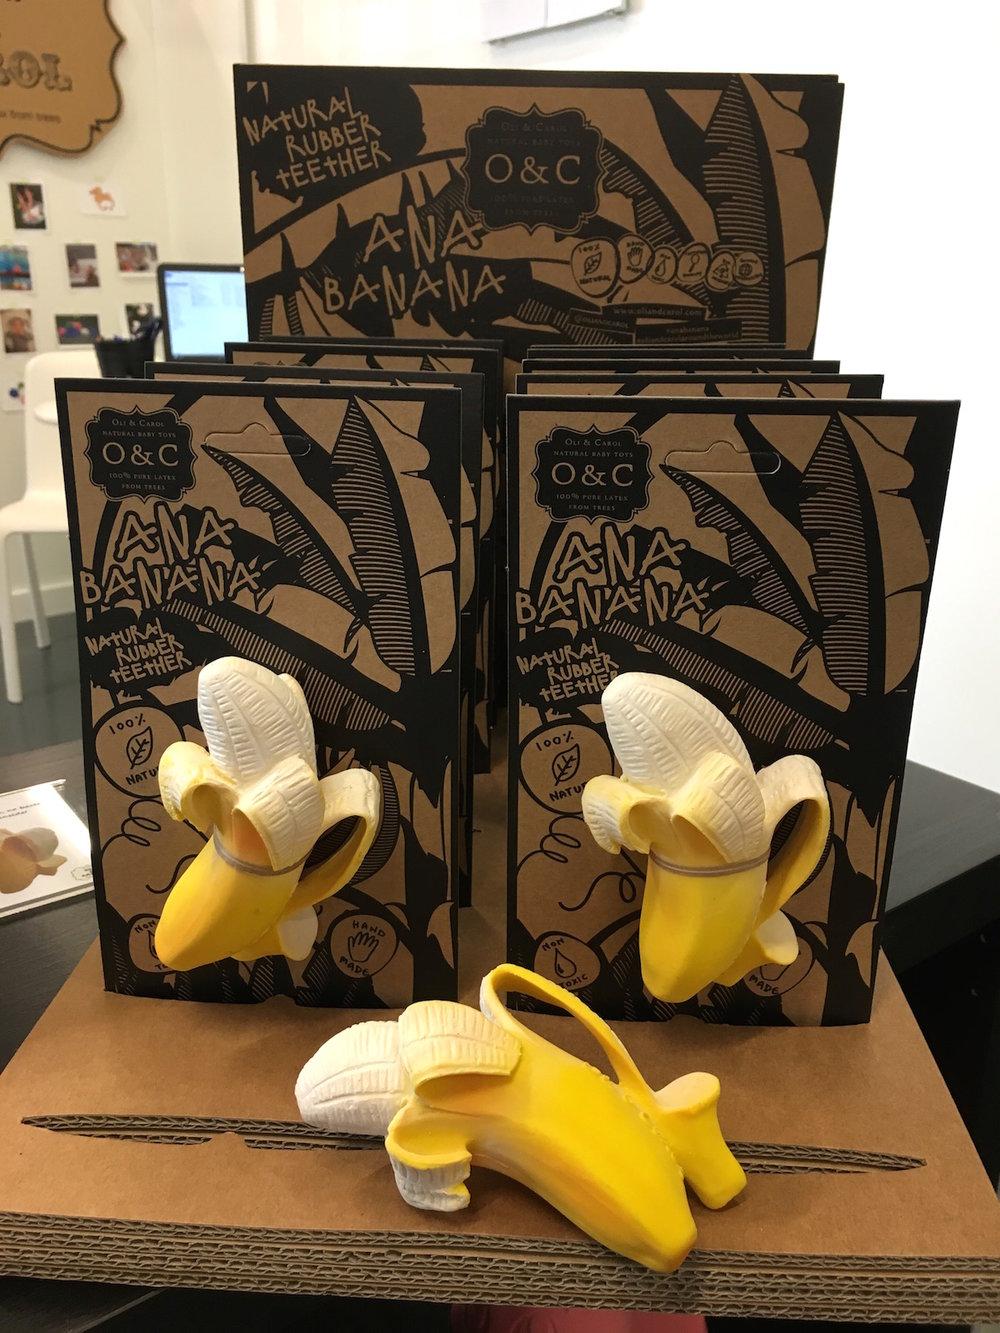 hoiberlin-oli&carol-playtime-banana.jpg